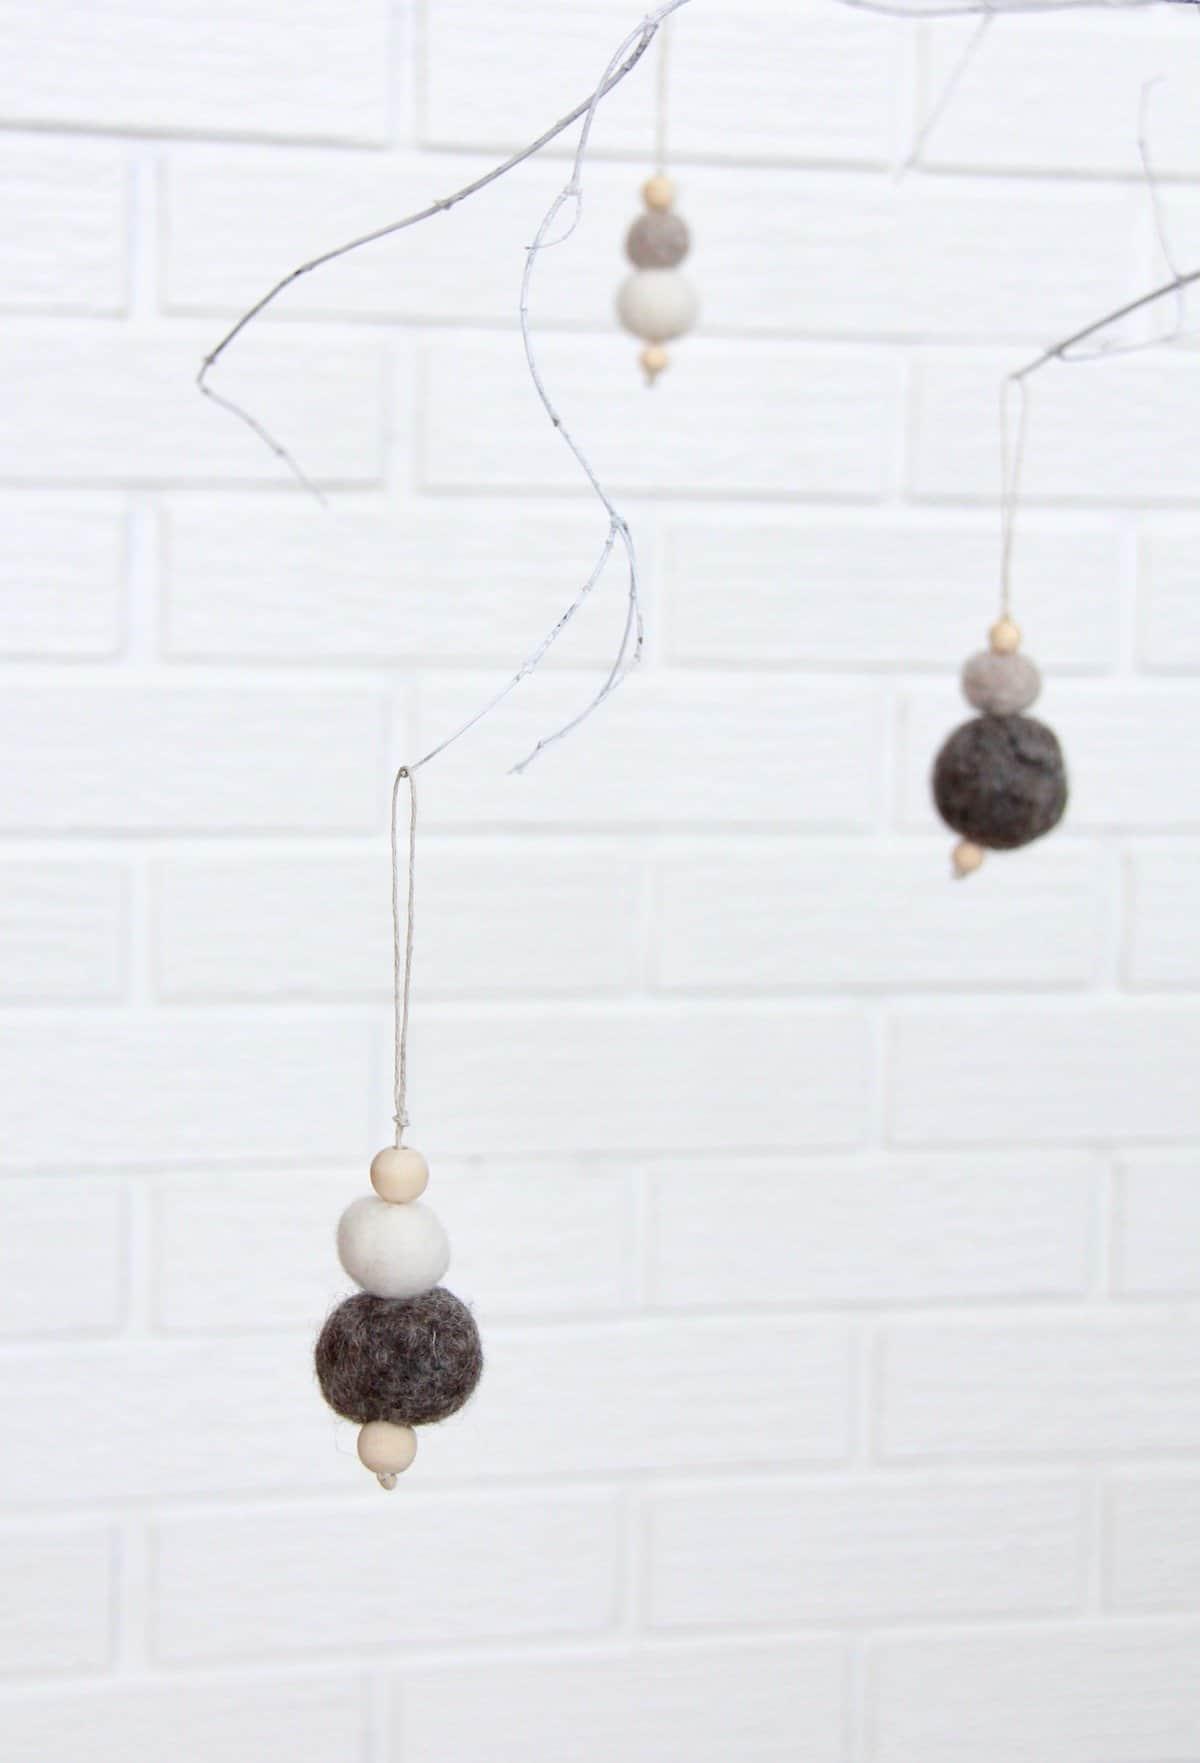 How to make felt ornaments home for the harvest solutioingenieria Choice Image